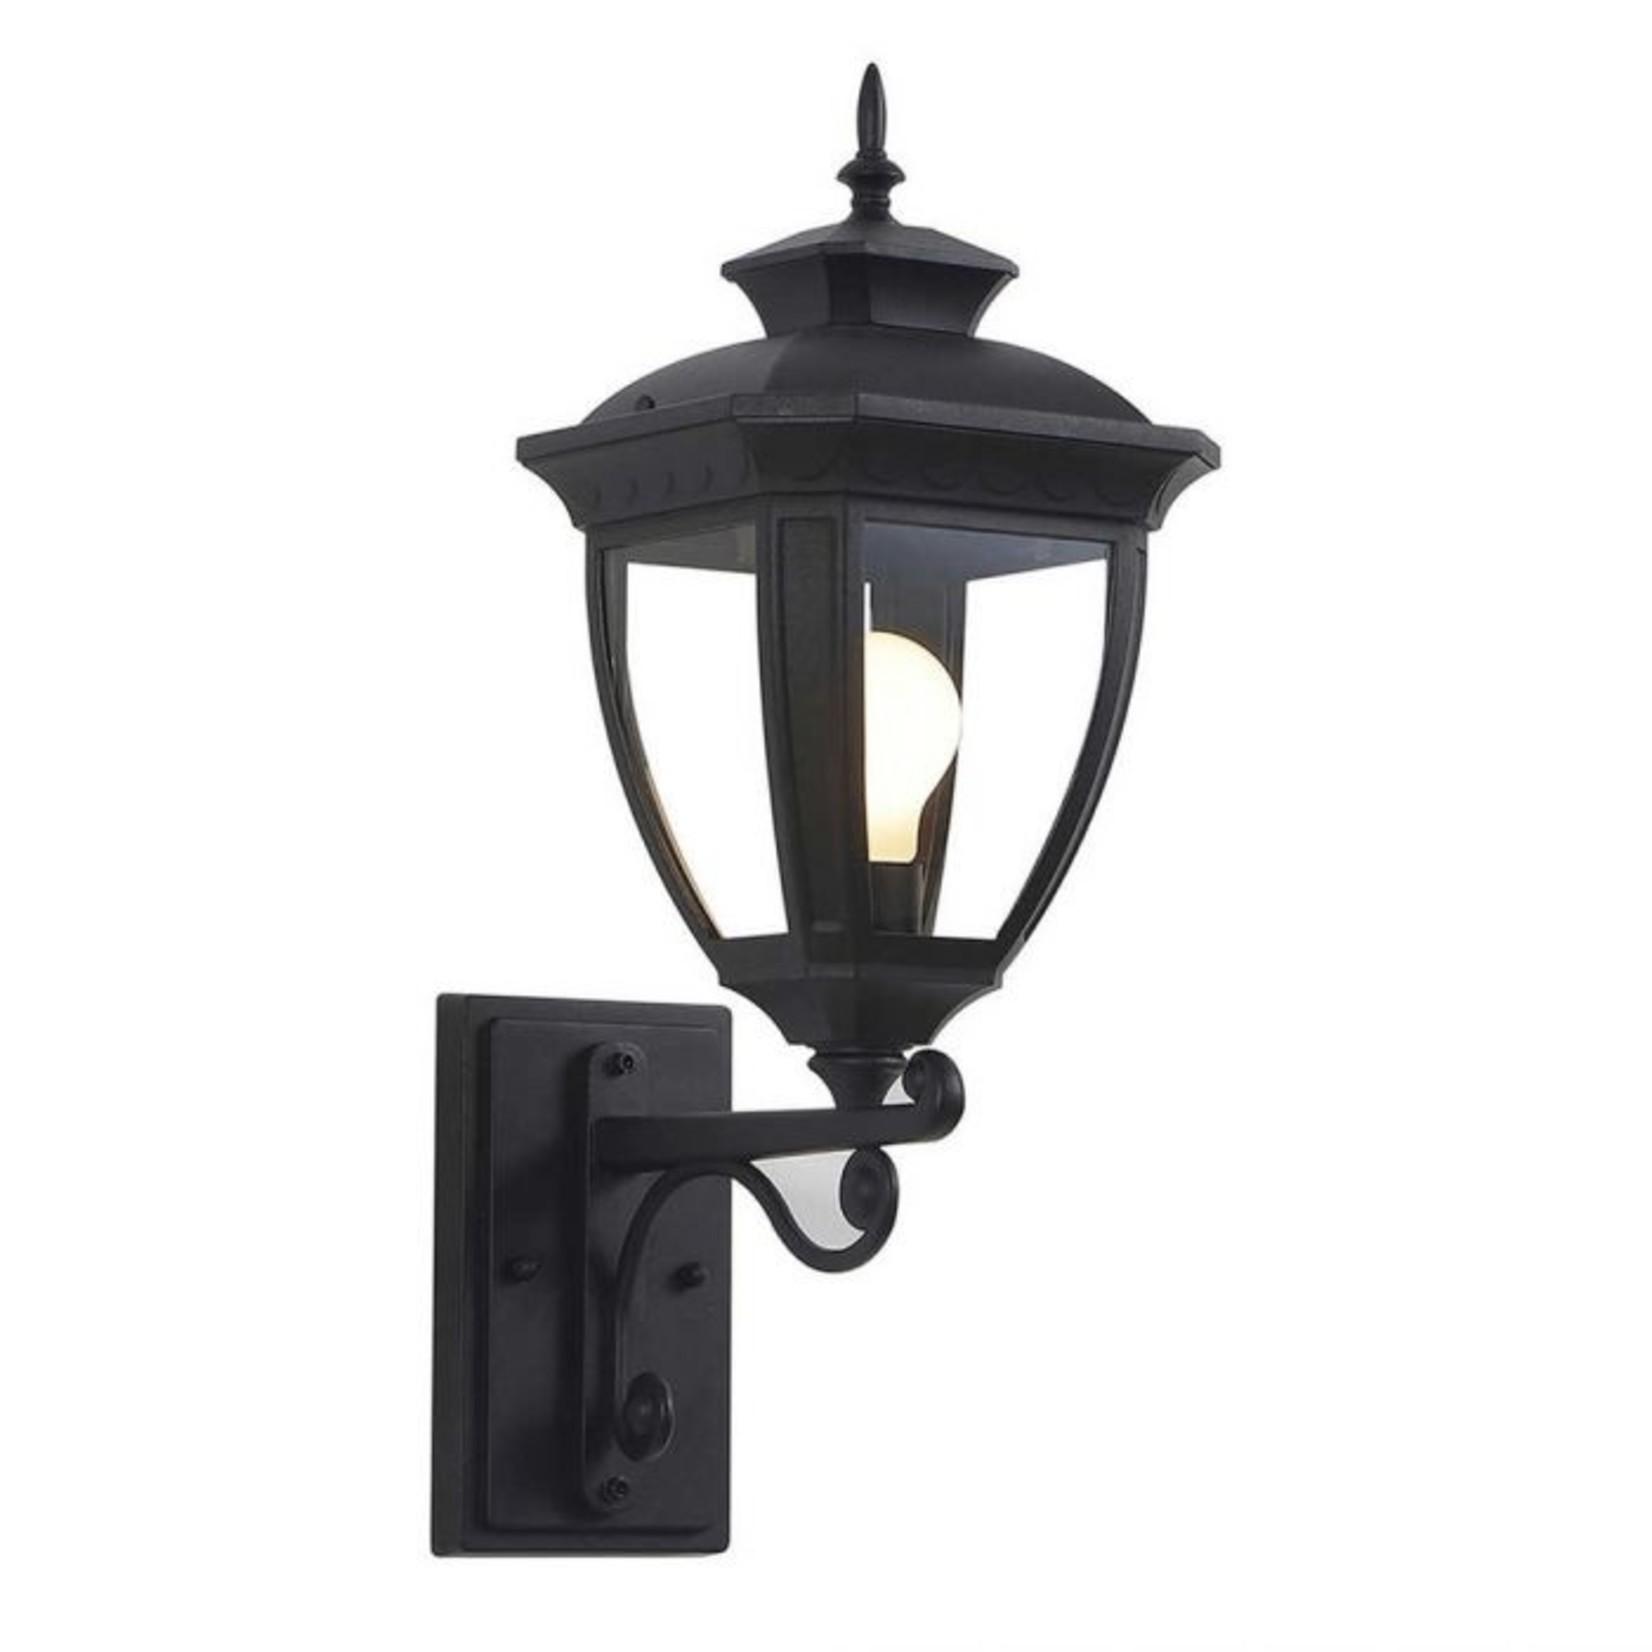 Ove Alice outdoor light black